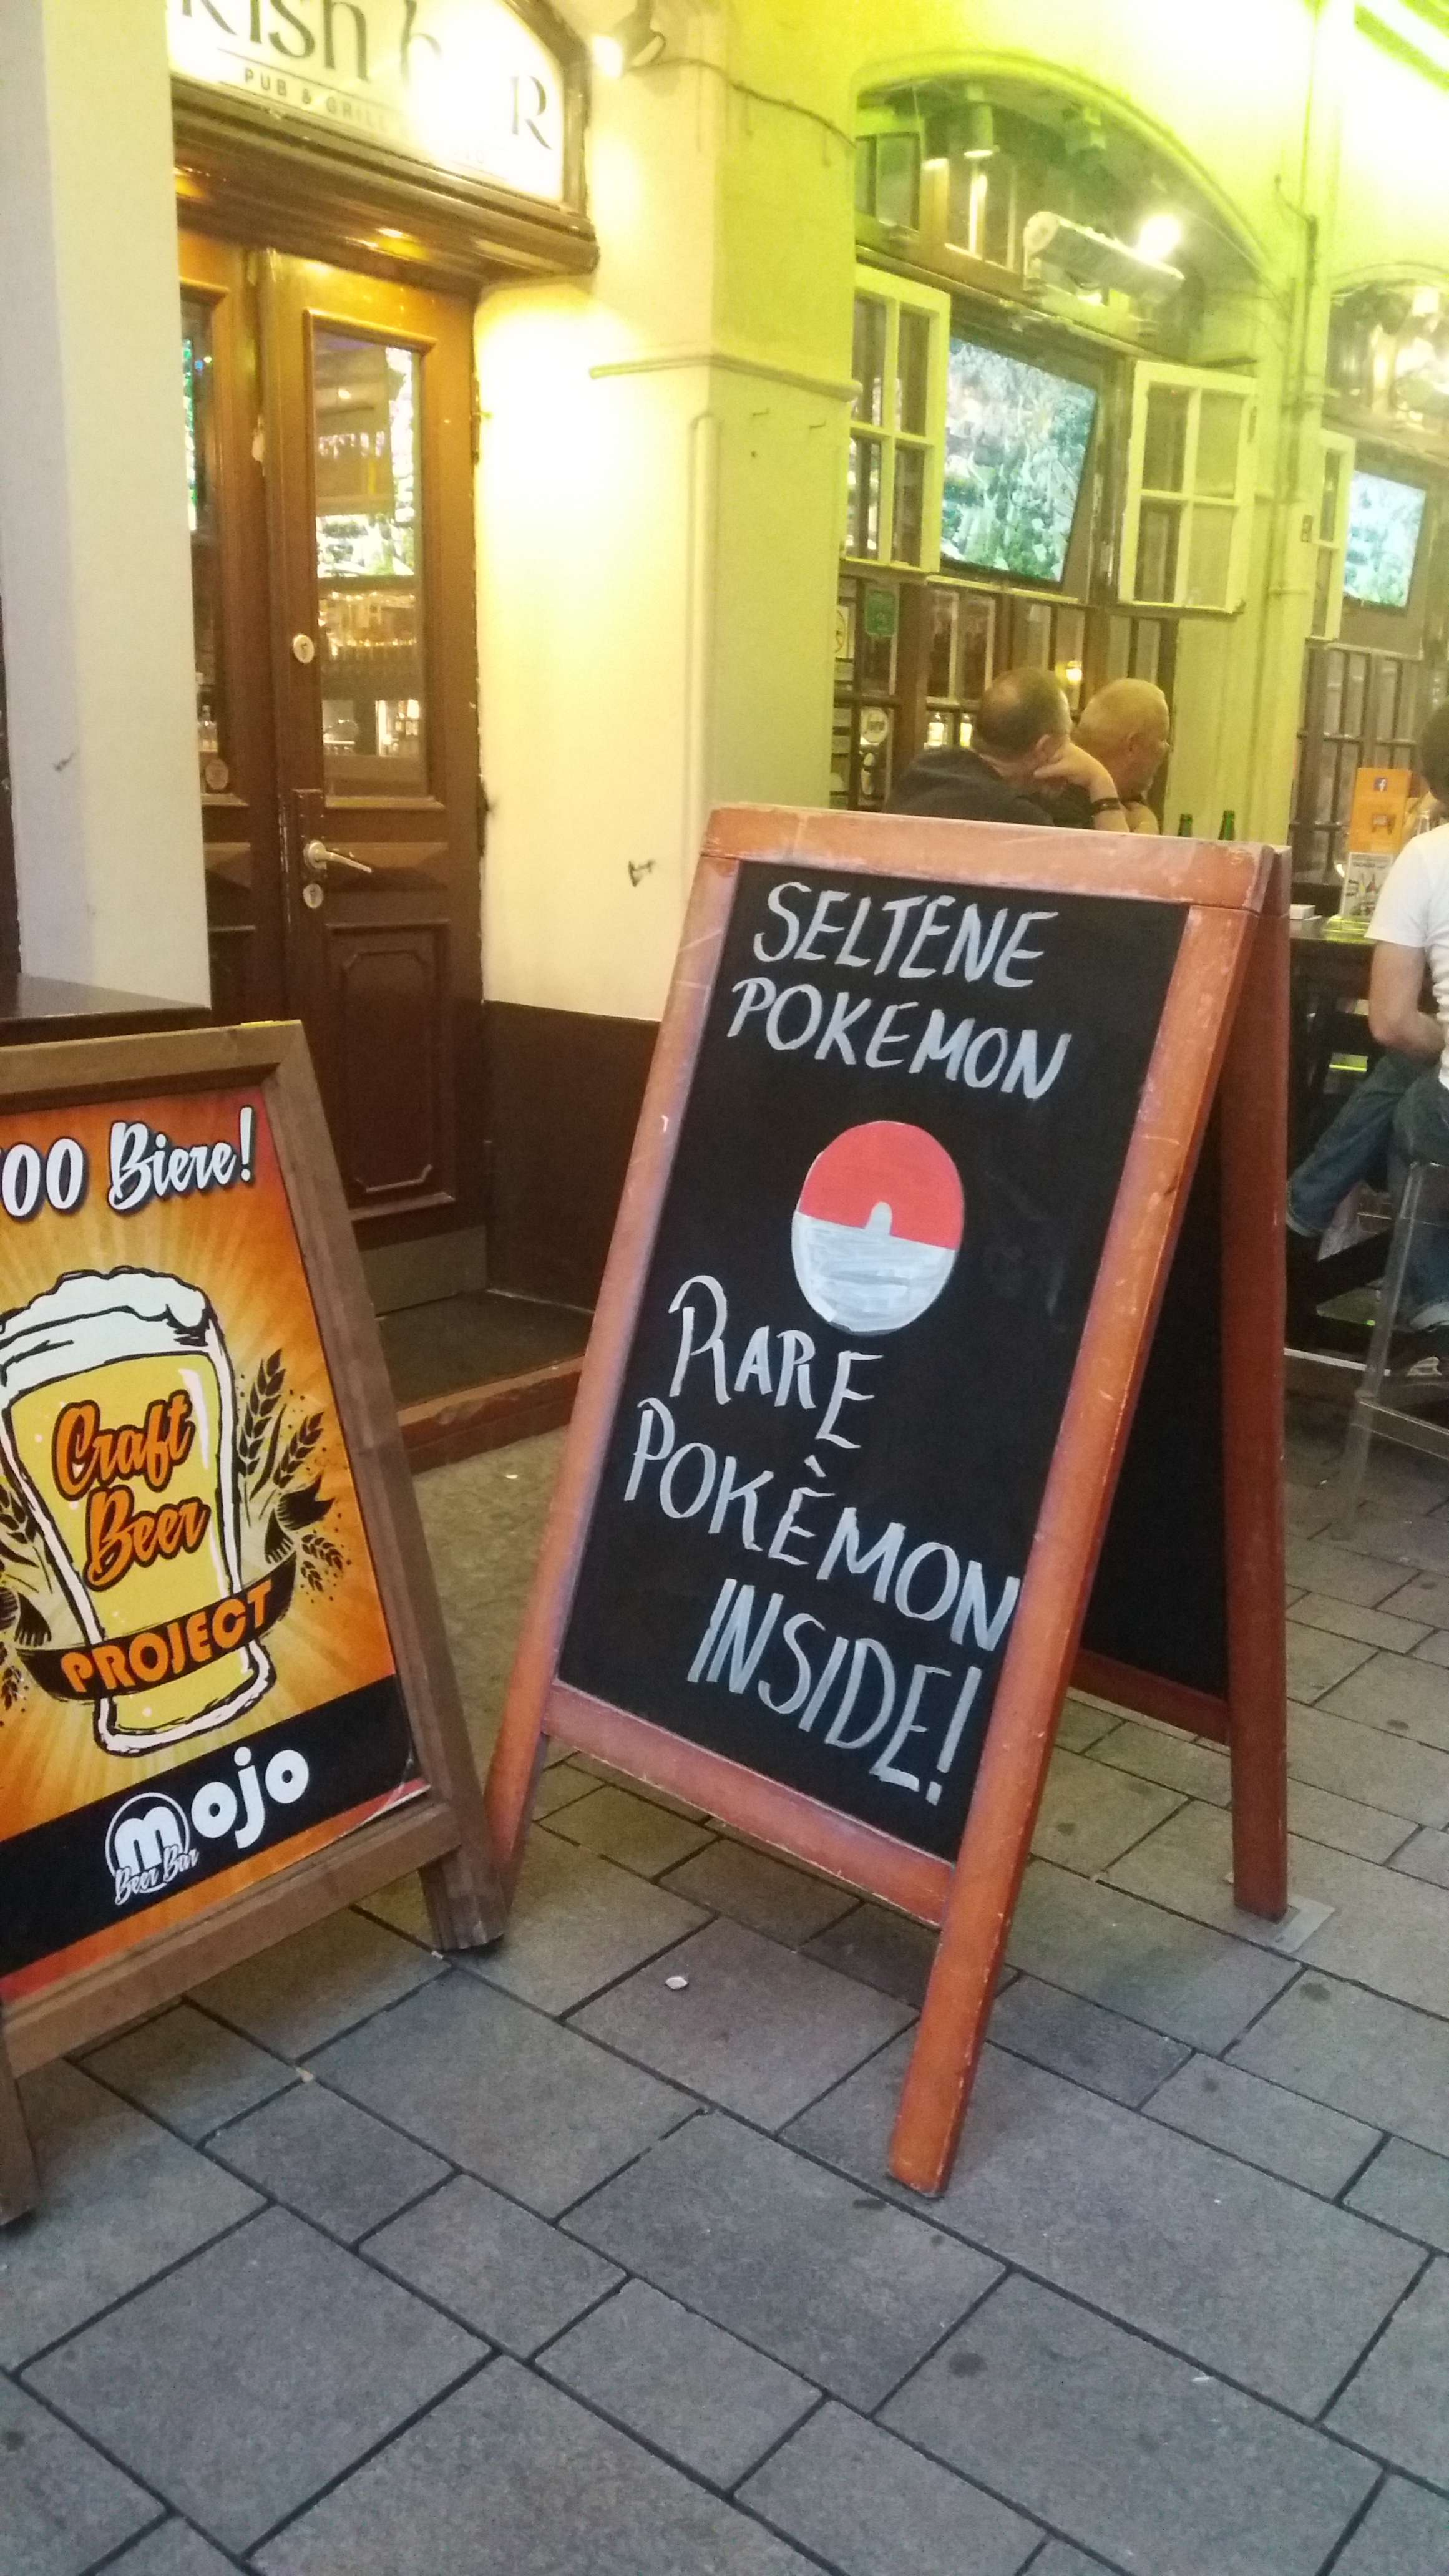 Pokémon Go - Seltene Pokémon?